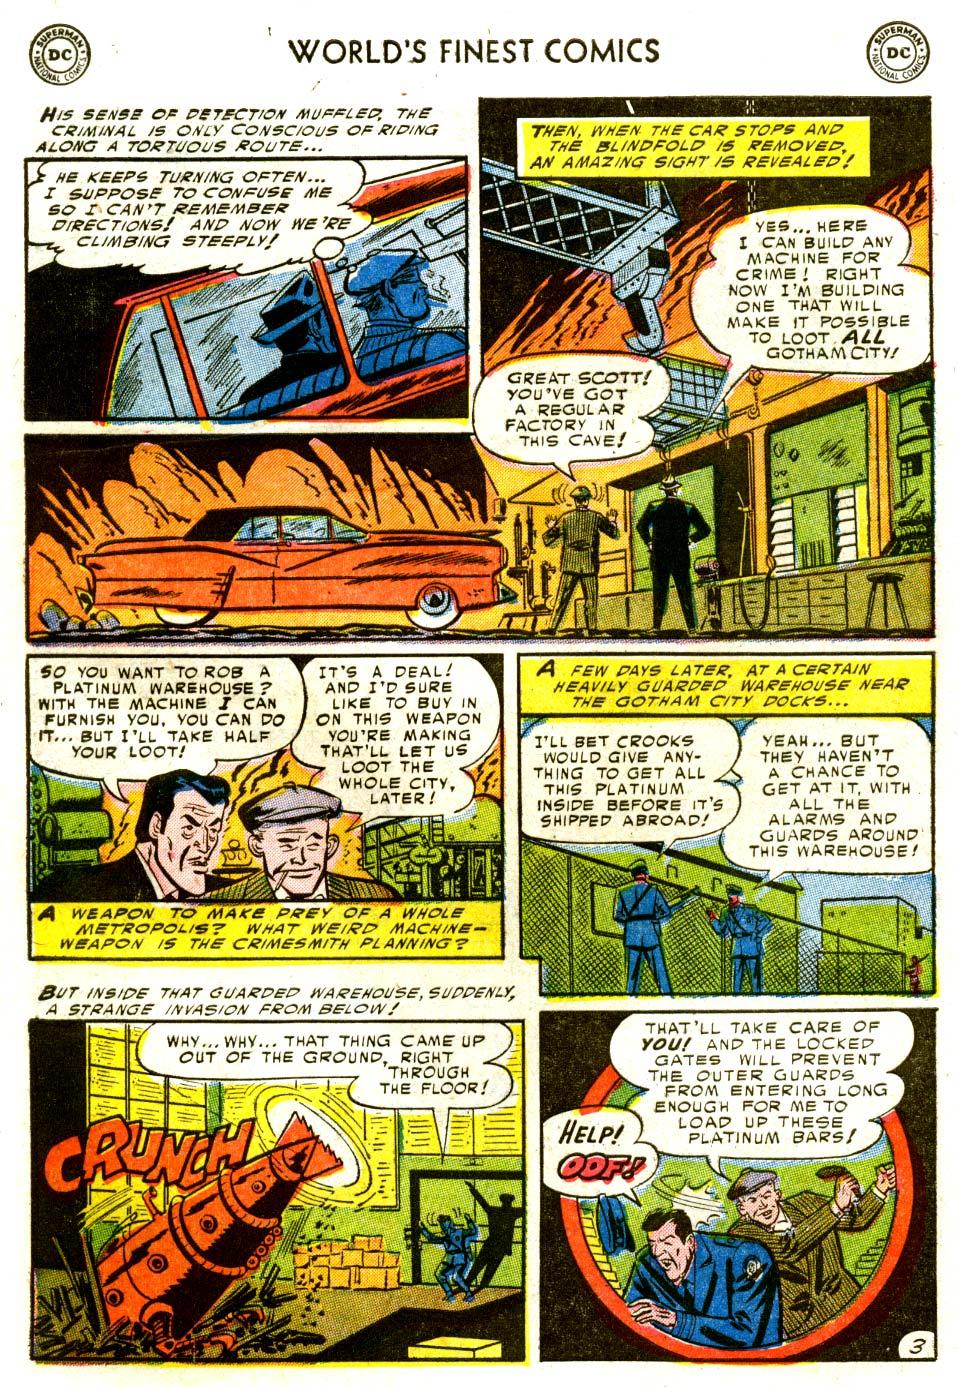 Read online World's Finest Comics comic -  Issue #68 - 56